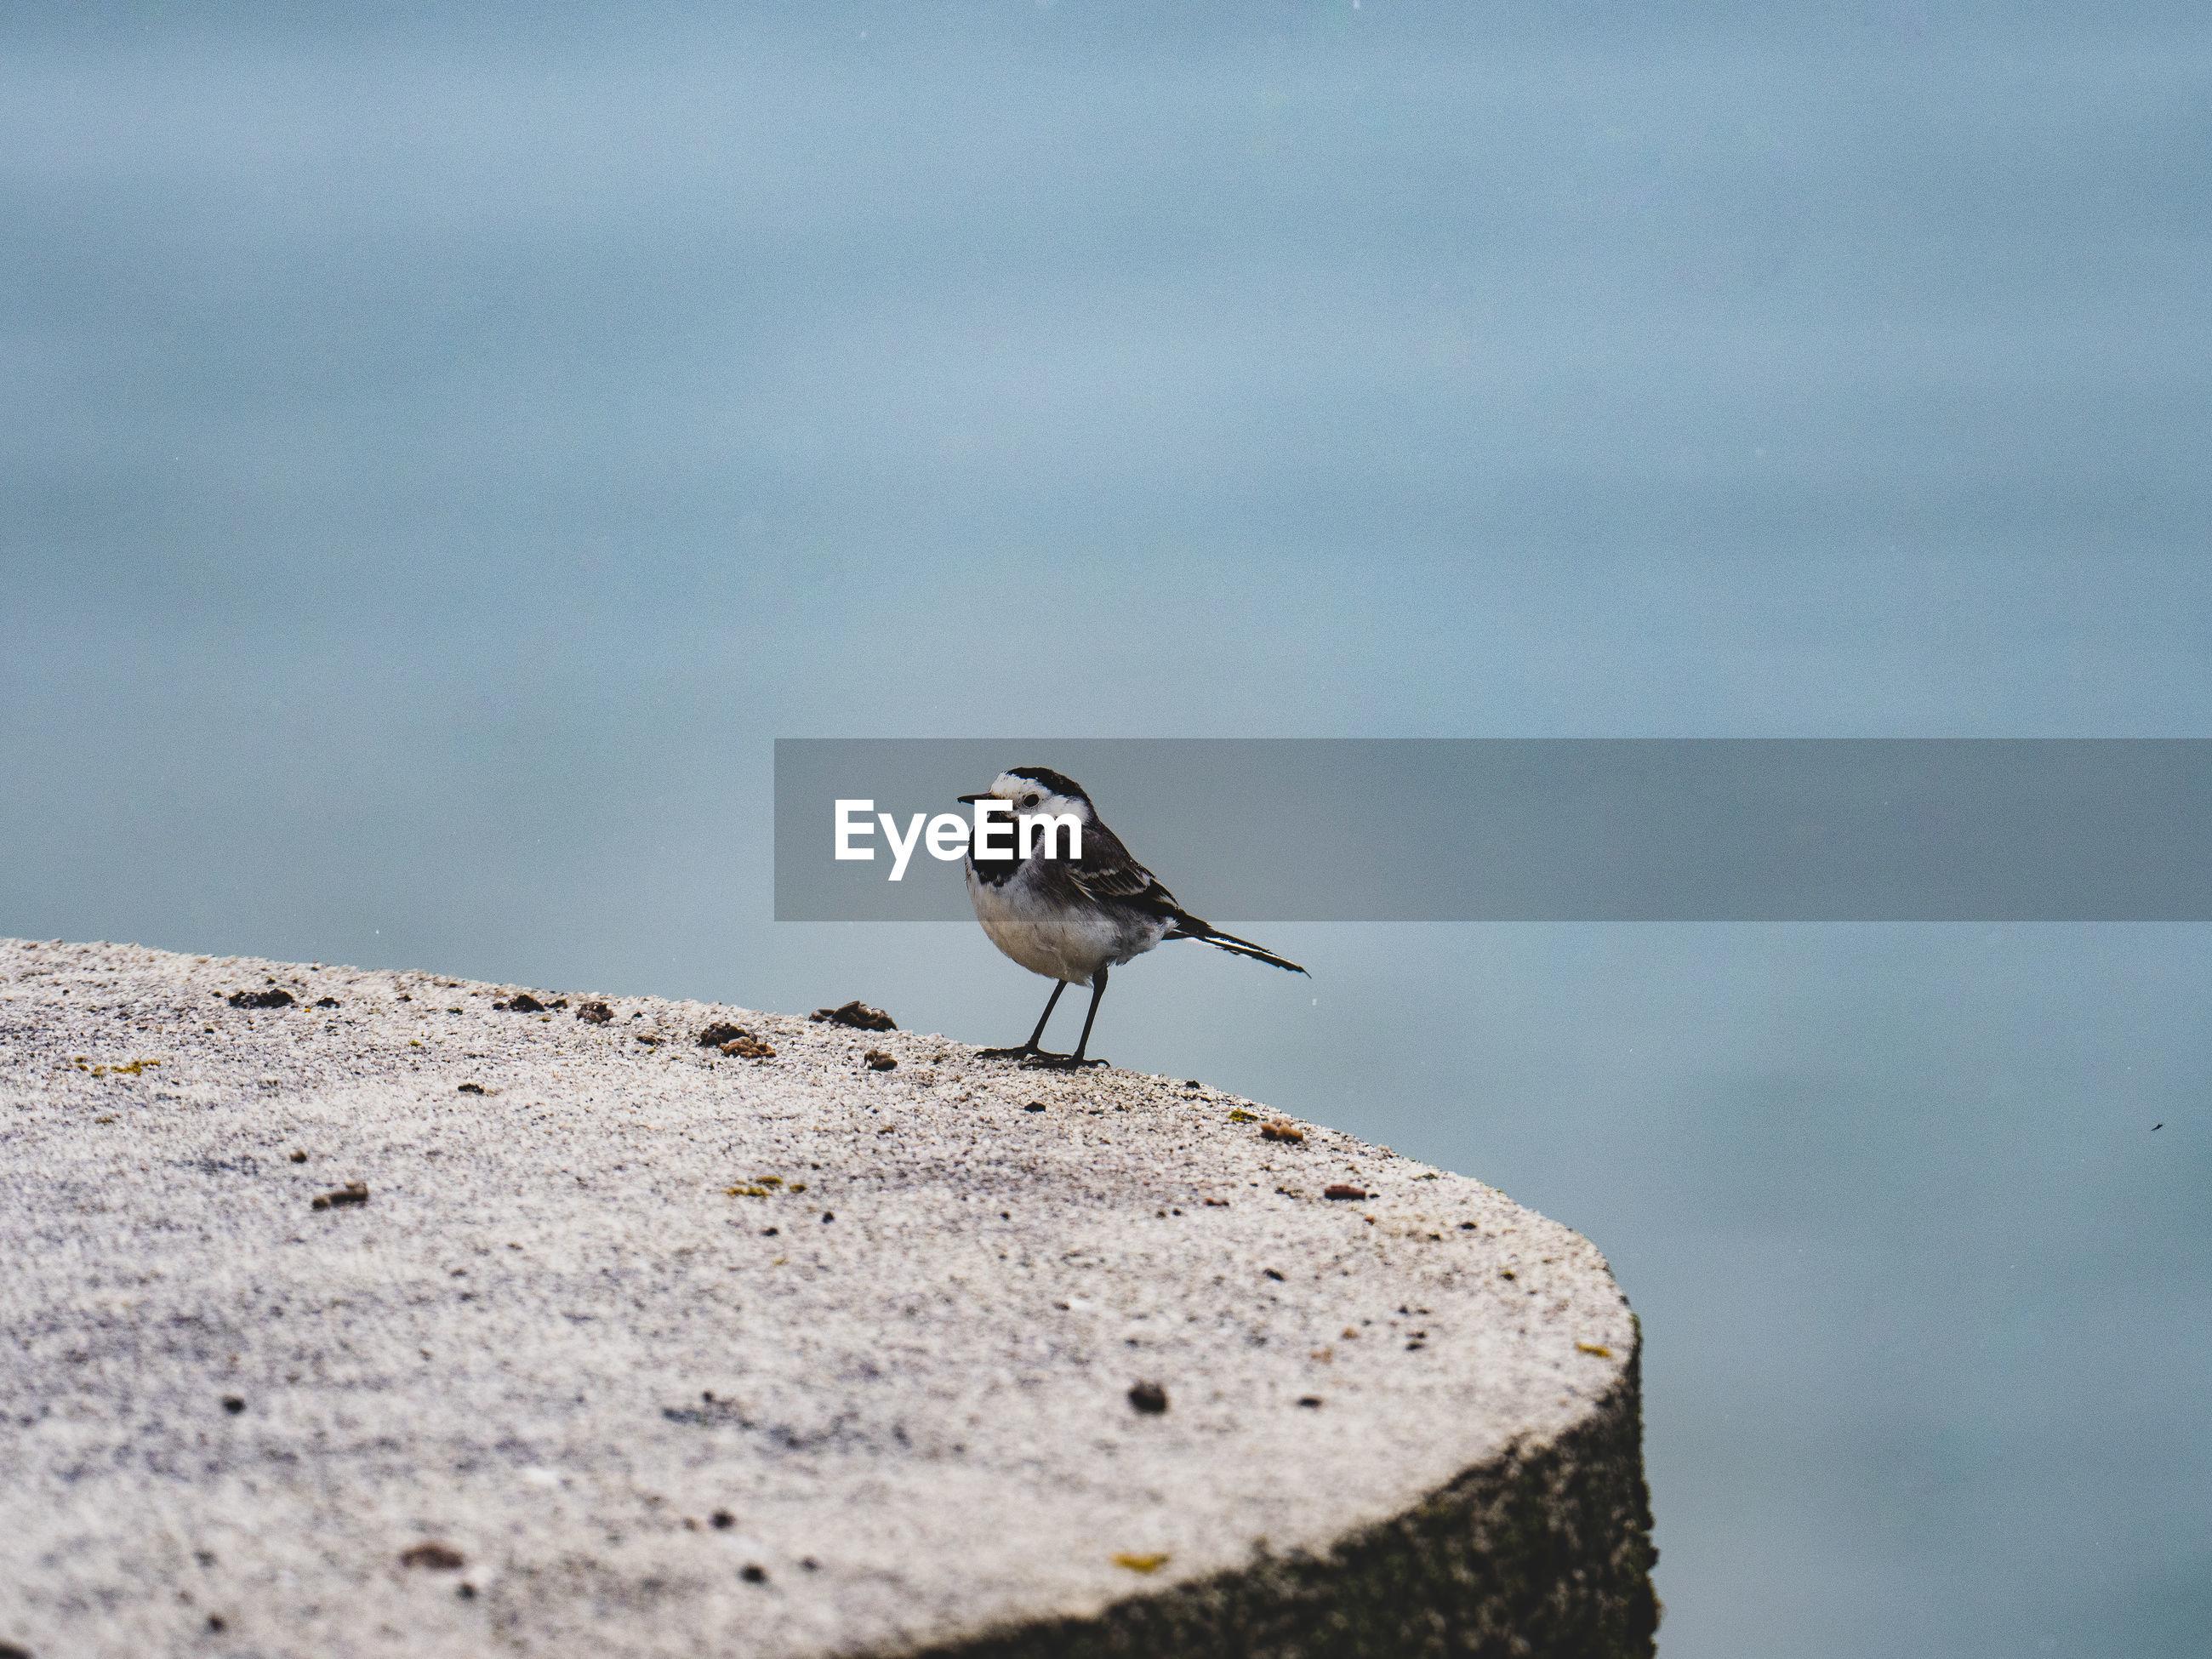 BIRDS PERCHING ON A WALL